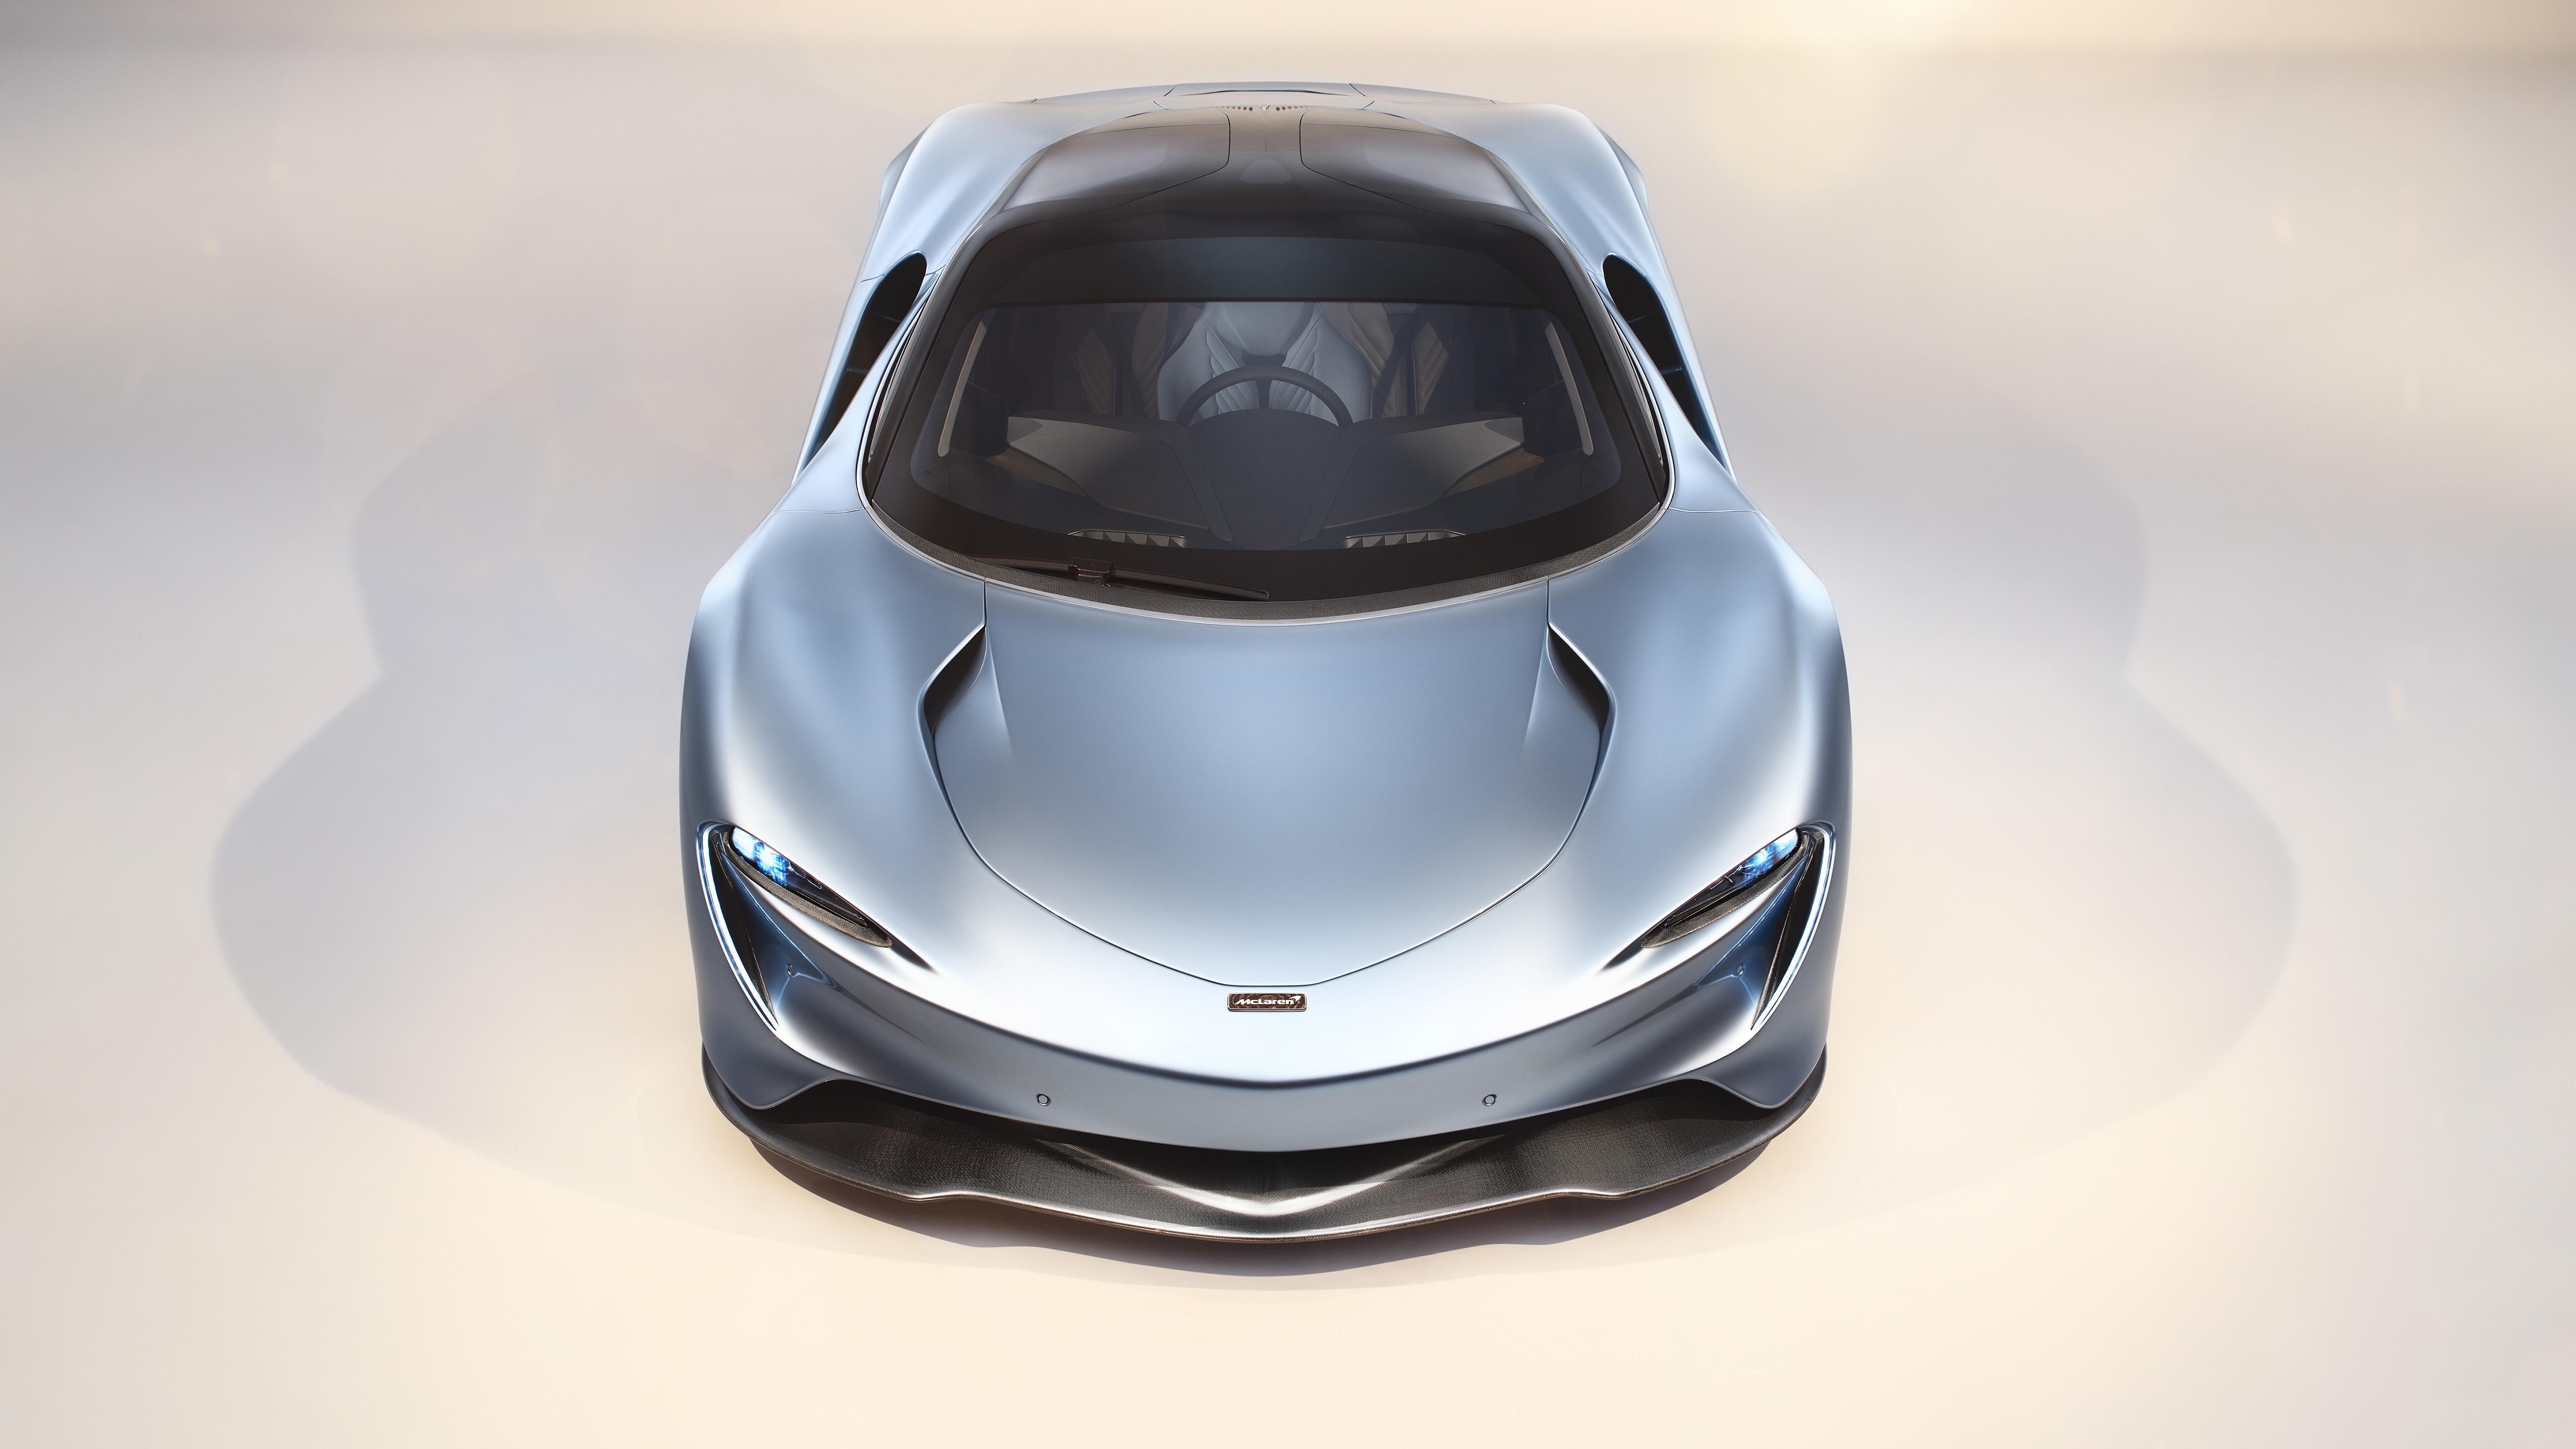 2019 McLaren Speedtail 5K Wallpaper HD Car Wallpapers ID 11481 5120x2880